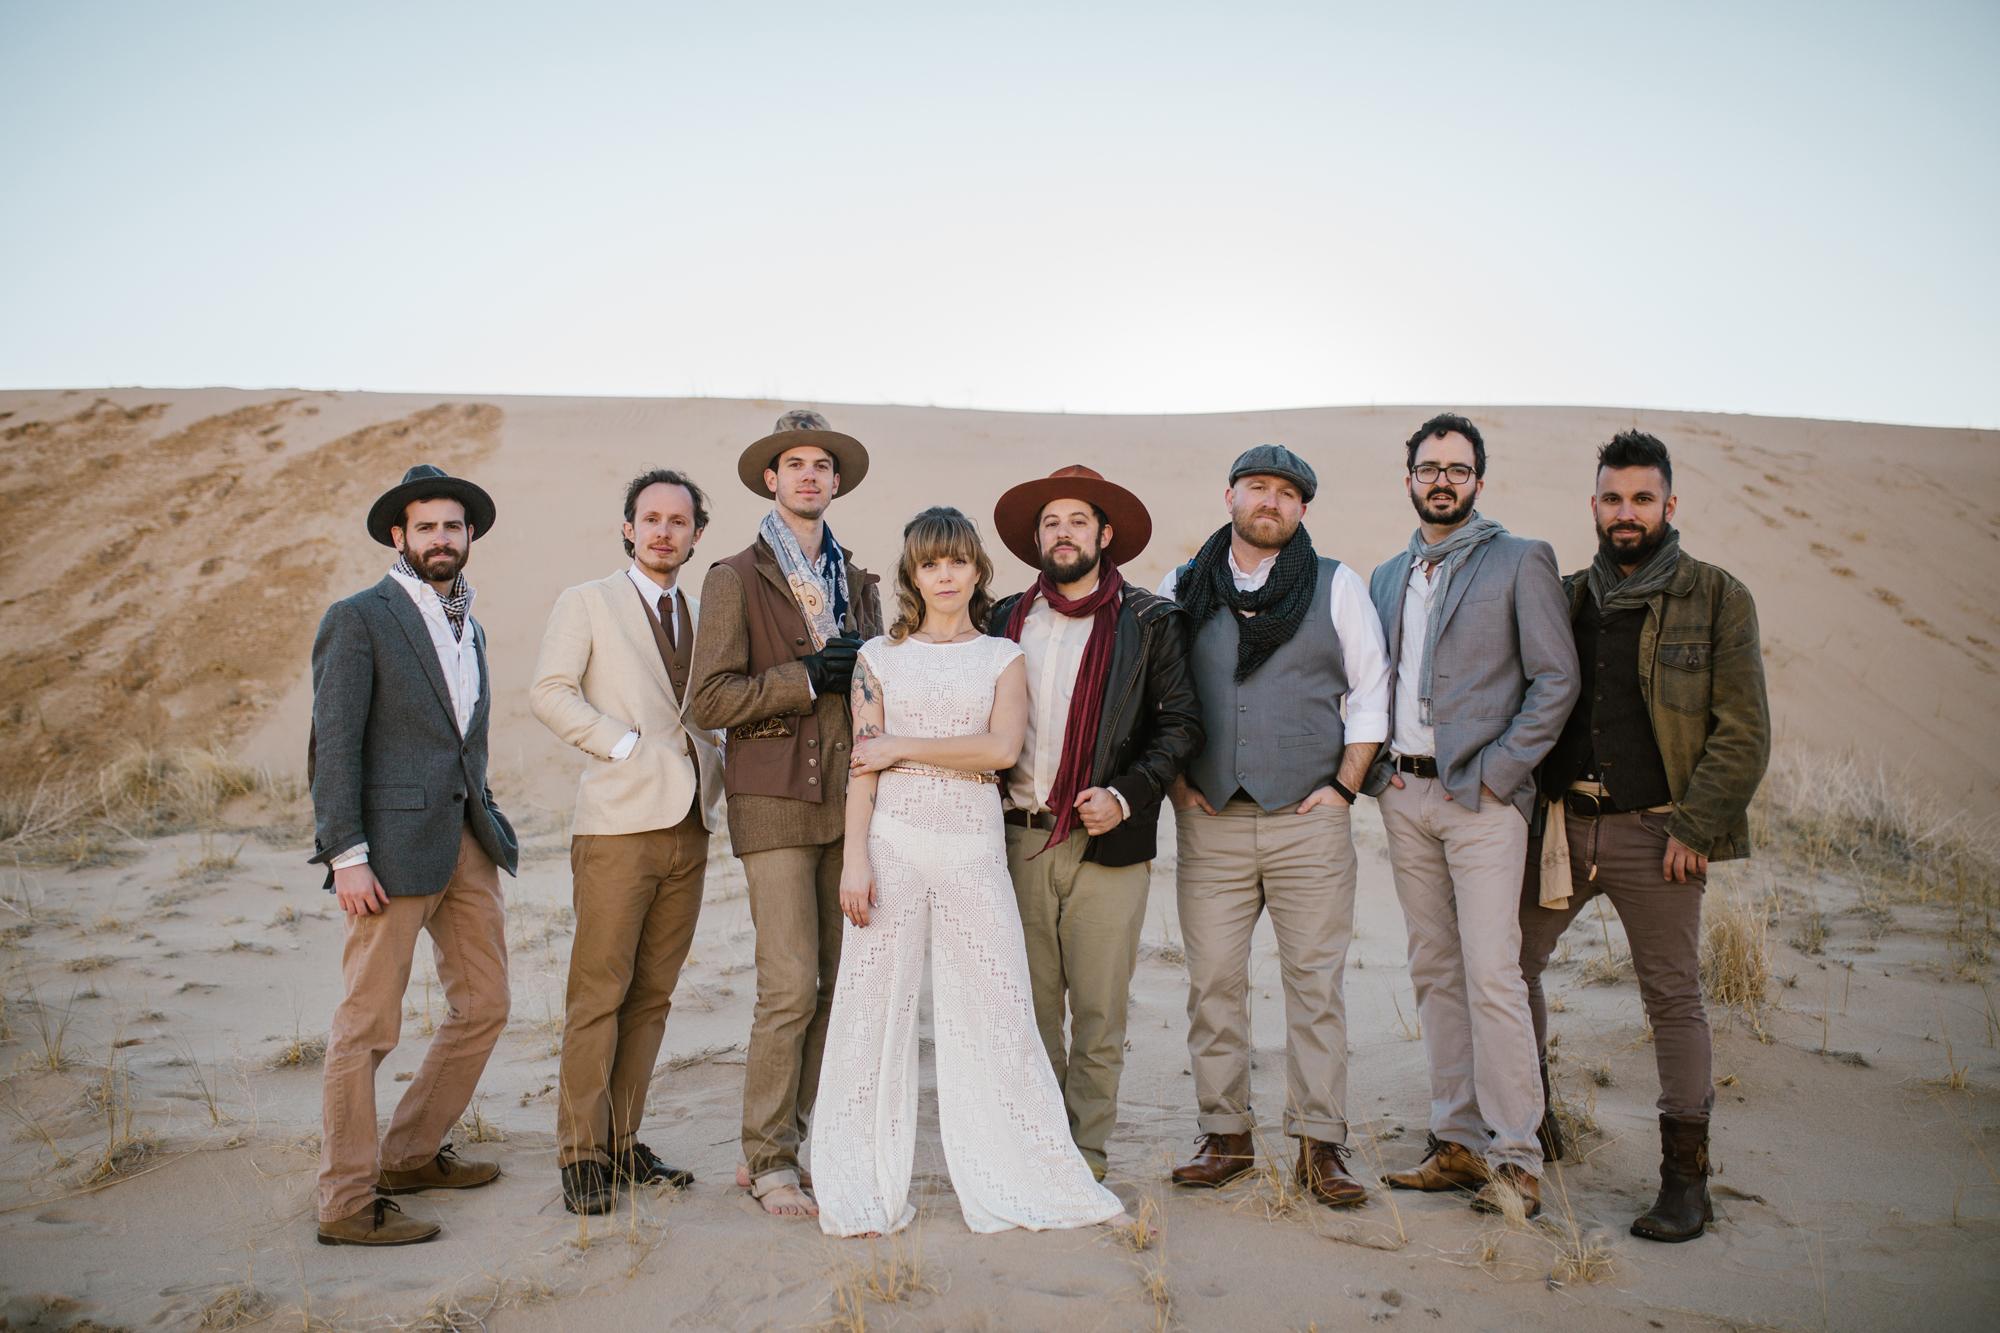 MIXTAPE: Dustbowl Revival's Myriad Musical Influences